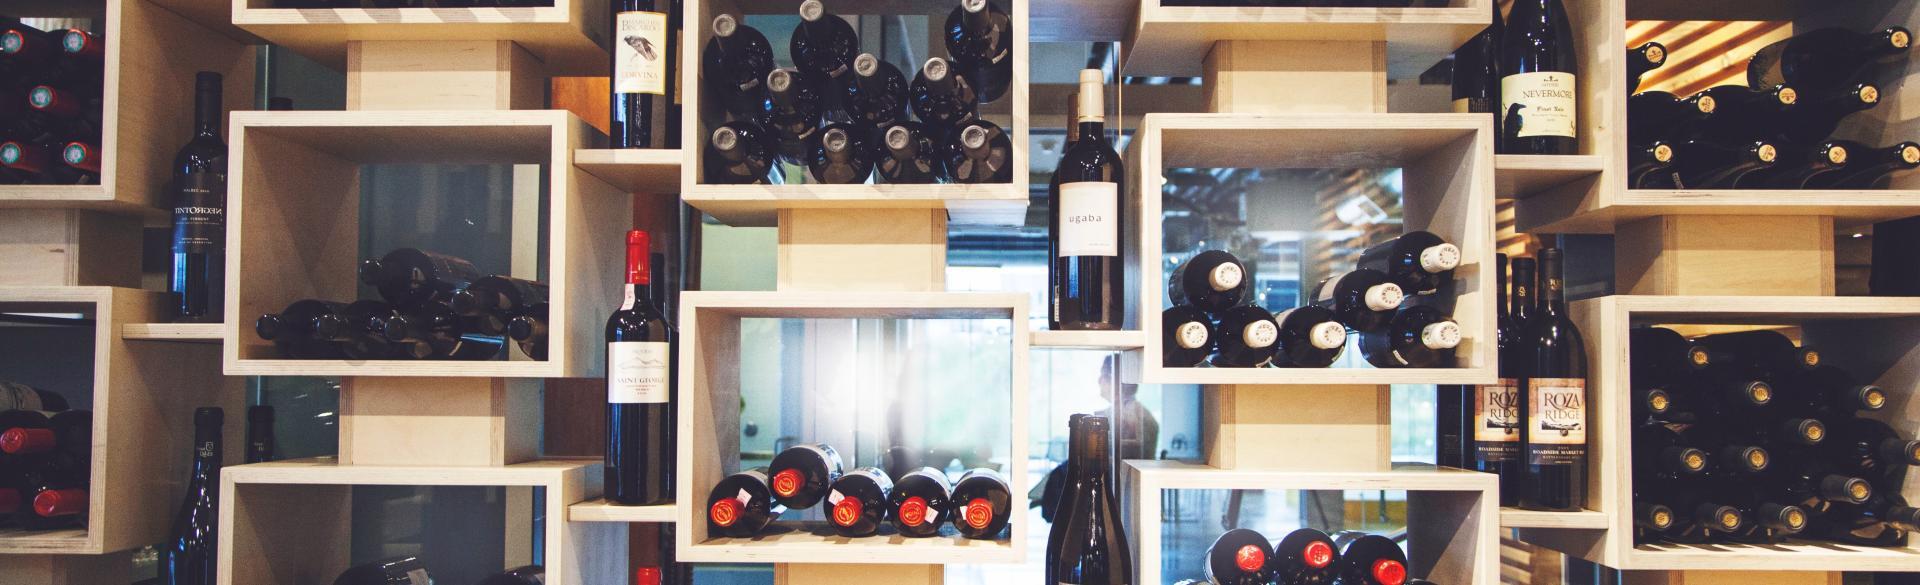 Aperitivo wine